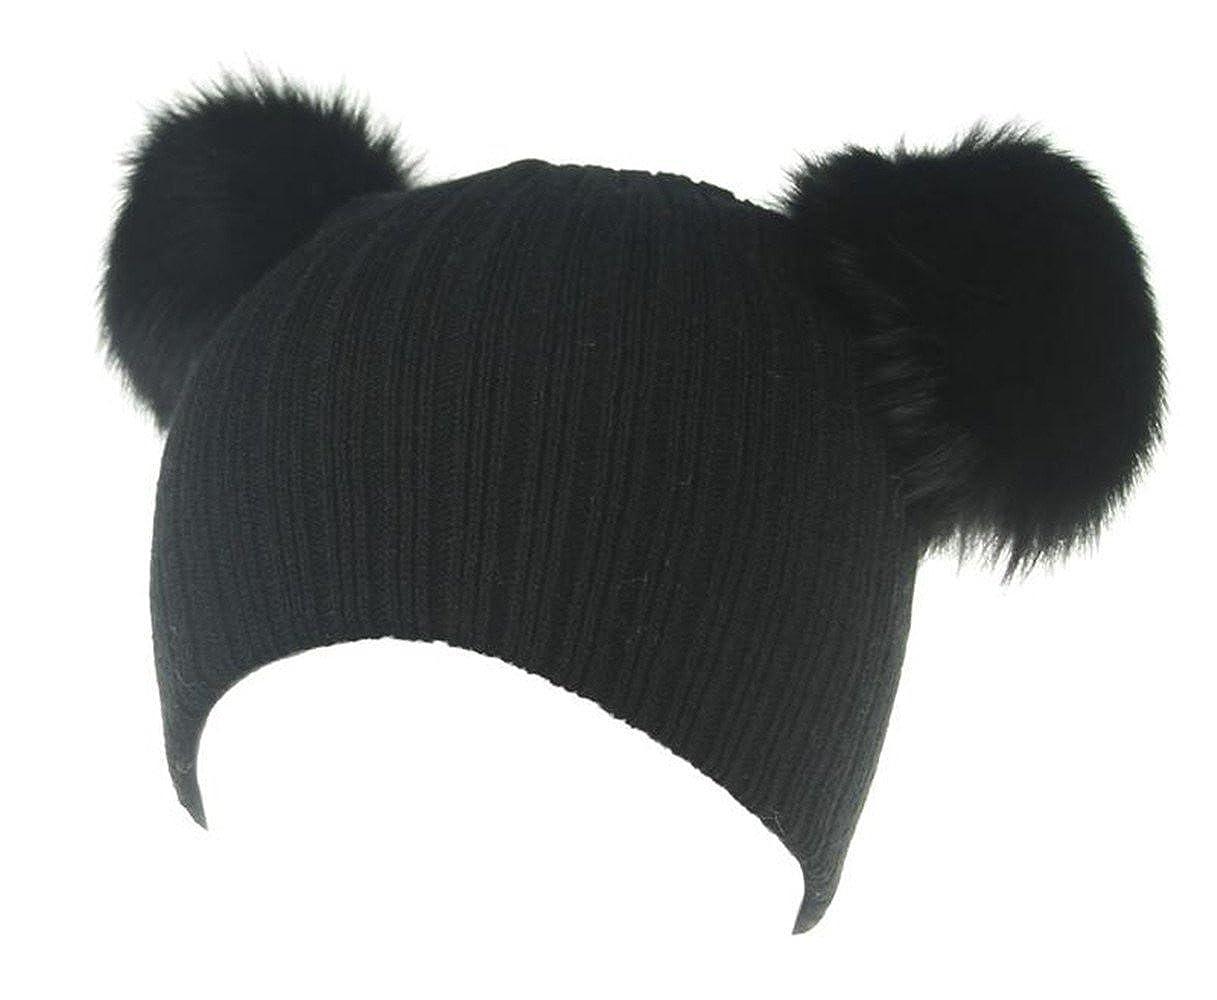 Winter Knit Double Pom Pom Beanie Hat With Hair Tie. Baby Kids Toddler Warm Hat